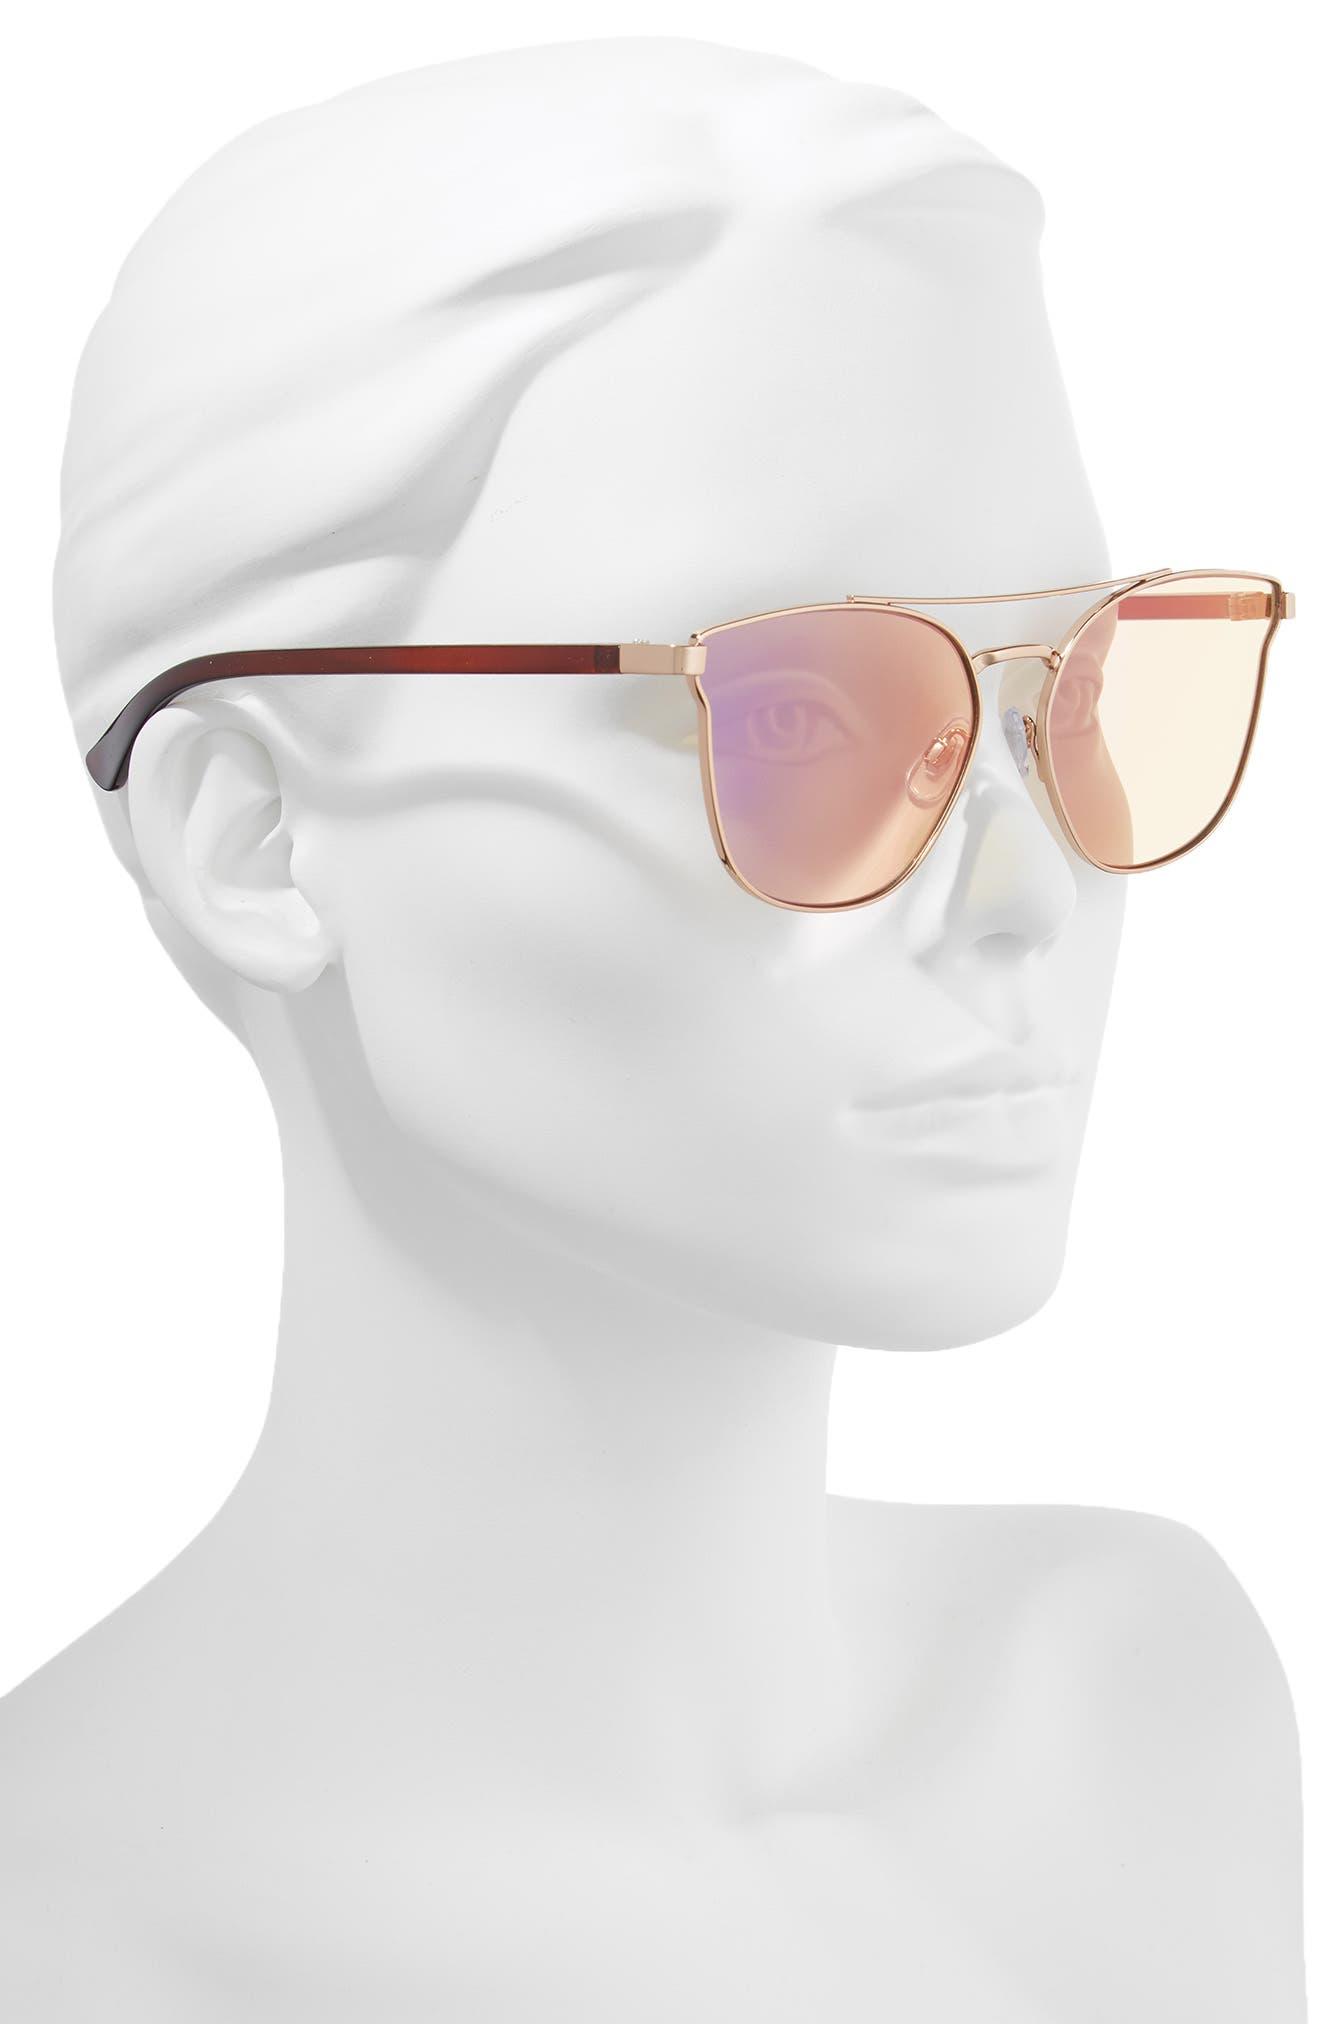 56mm Flat Mirrored Aviator Sunglasses,                             Alternate thumbnail 2, color,                             BRONZE/ BROWN